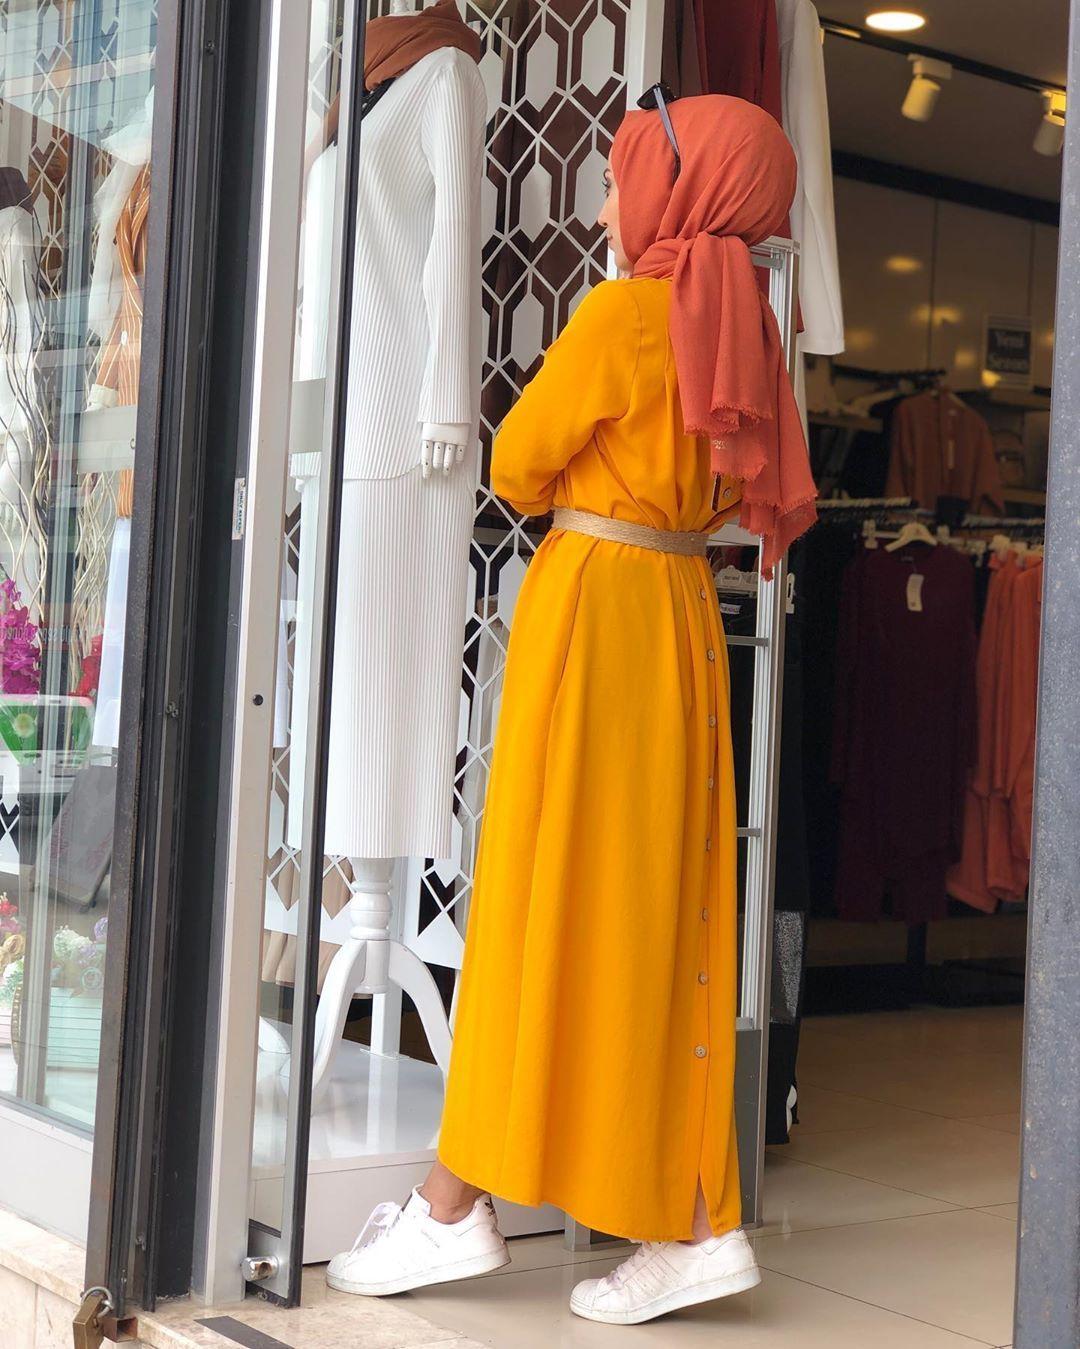 Instagram Da Ensar Butik Perakende Toptan Yepyeni Detay Tam Boy Tunigimiz Kemer Dahil Diger Renk Icin Sol Dresses With Sleeves Long Sleeve Dress Fashion